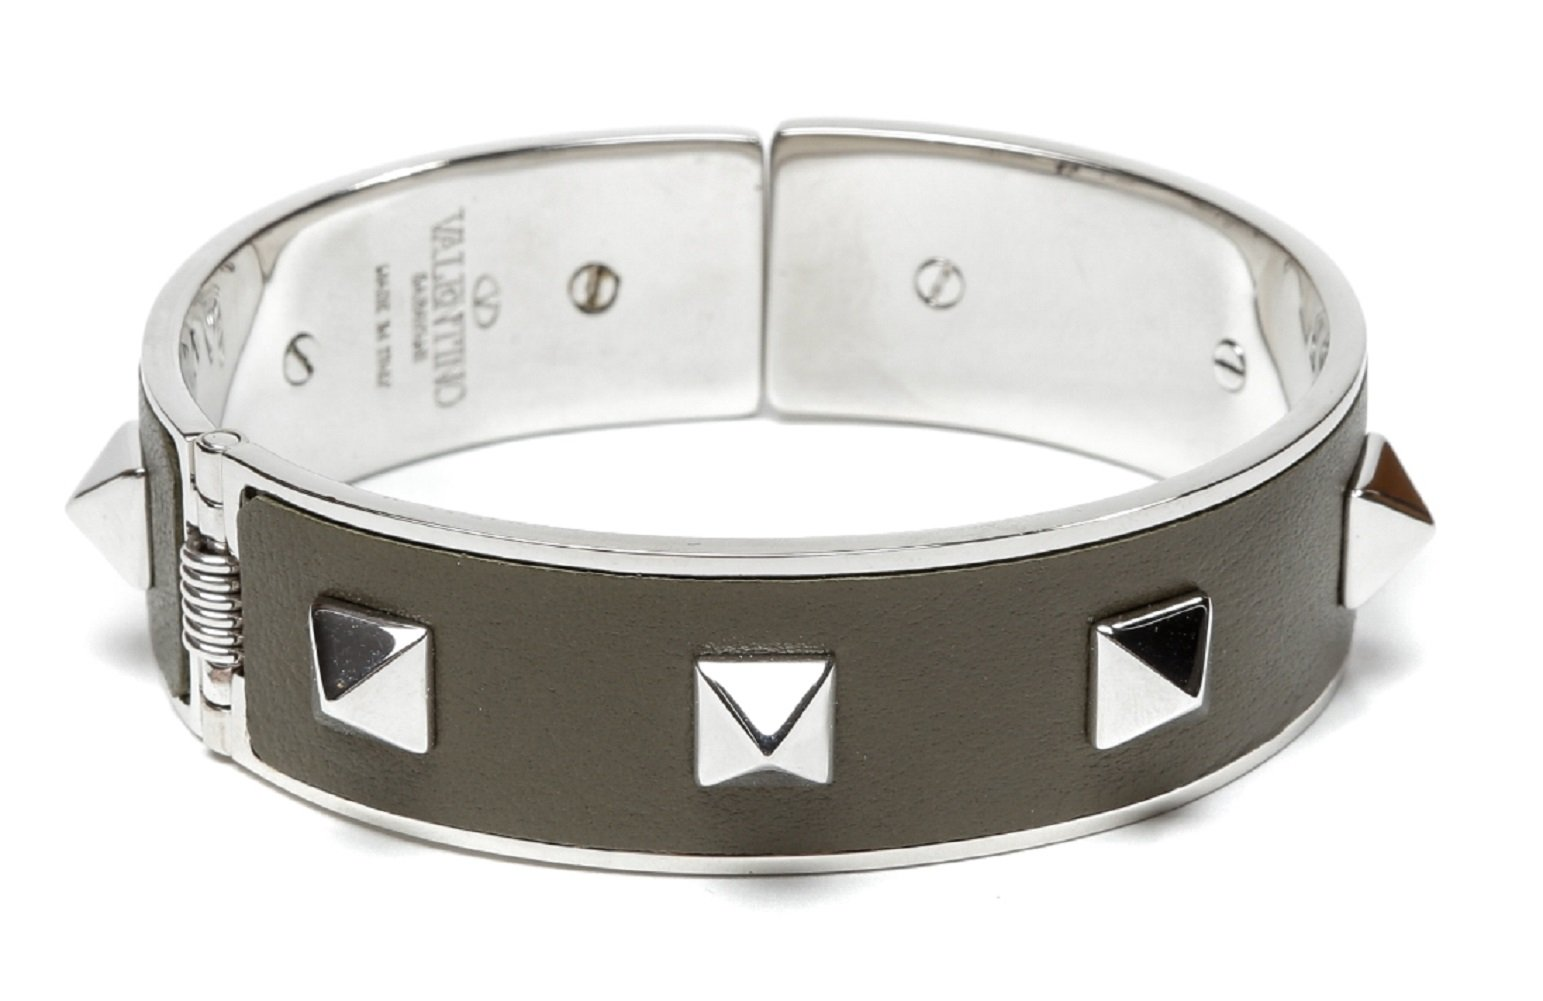 Wiberlux Valentino Women's Silver Stud Detail Steel Cuff Bracelet One Size Olive